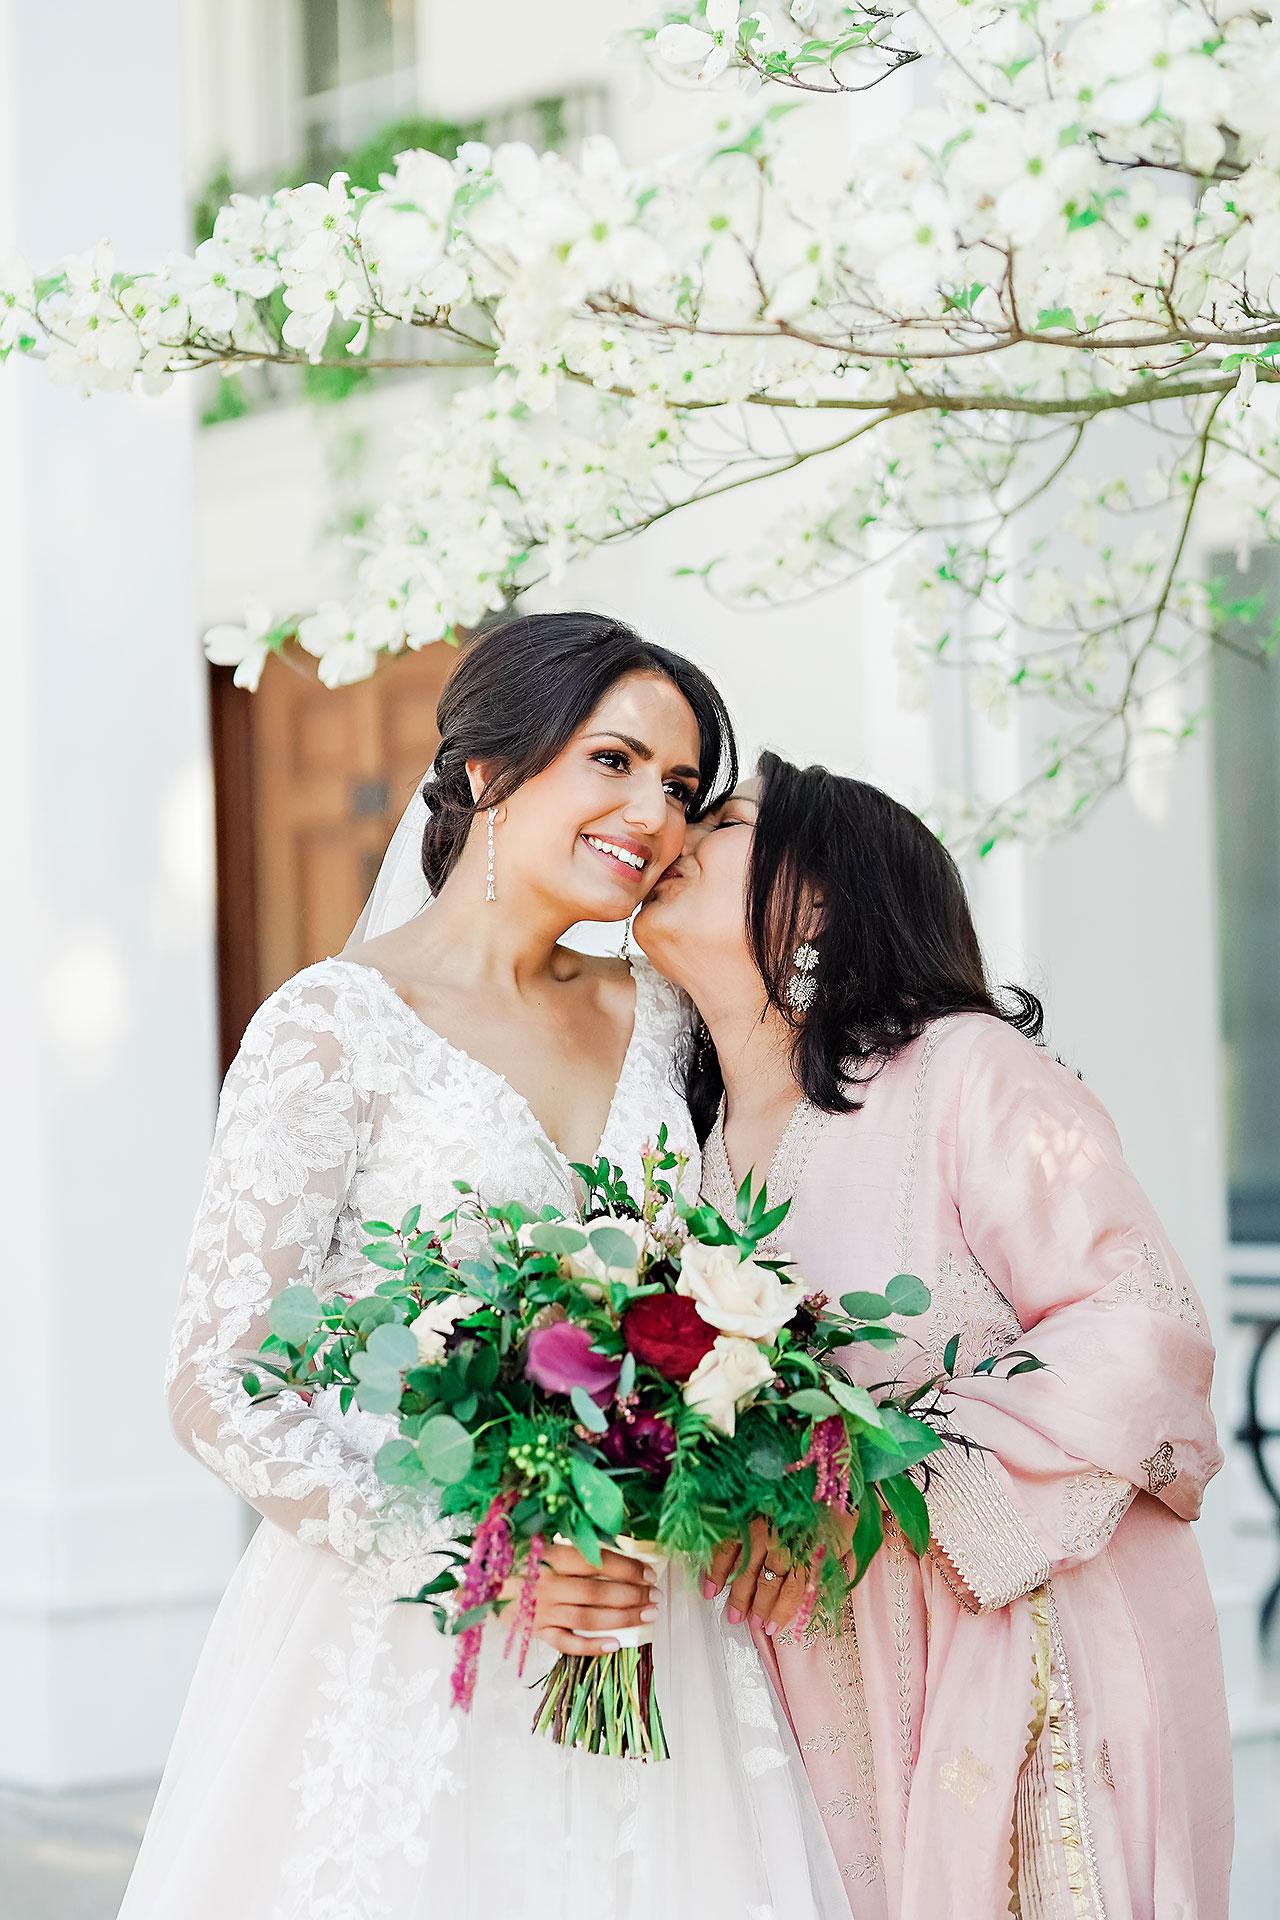 Nadia Parker Black Iris Estate Carmel Indiana Wedding May 2021 147